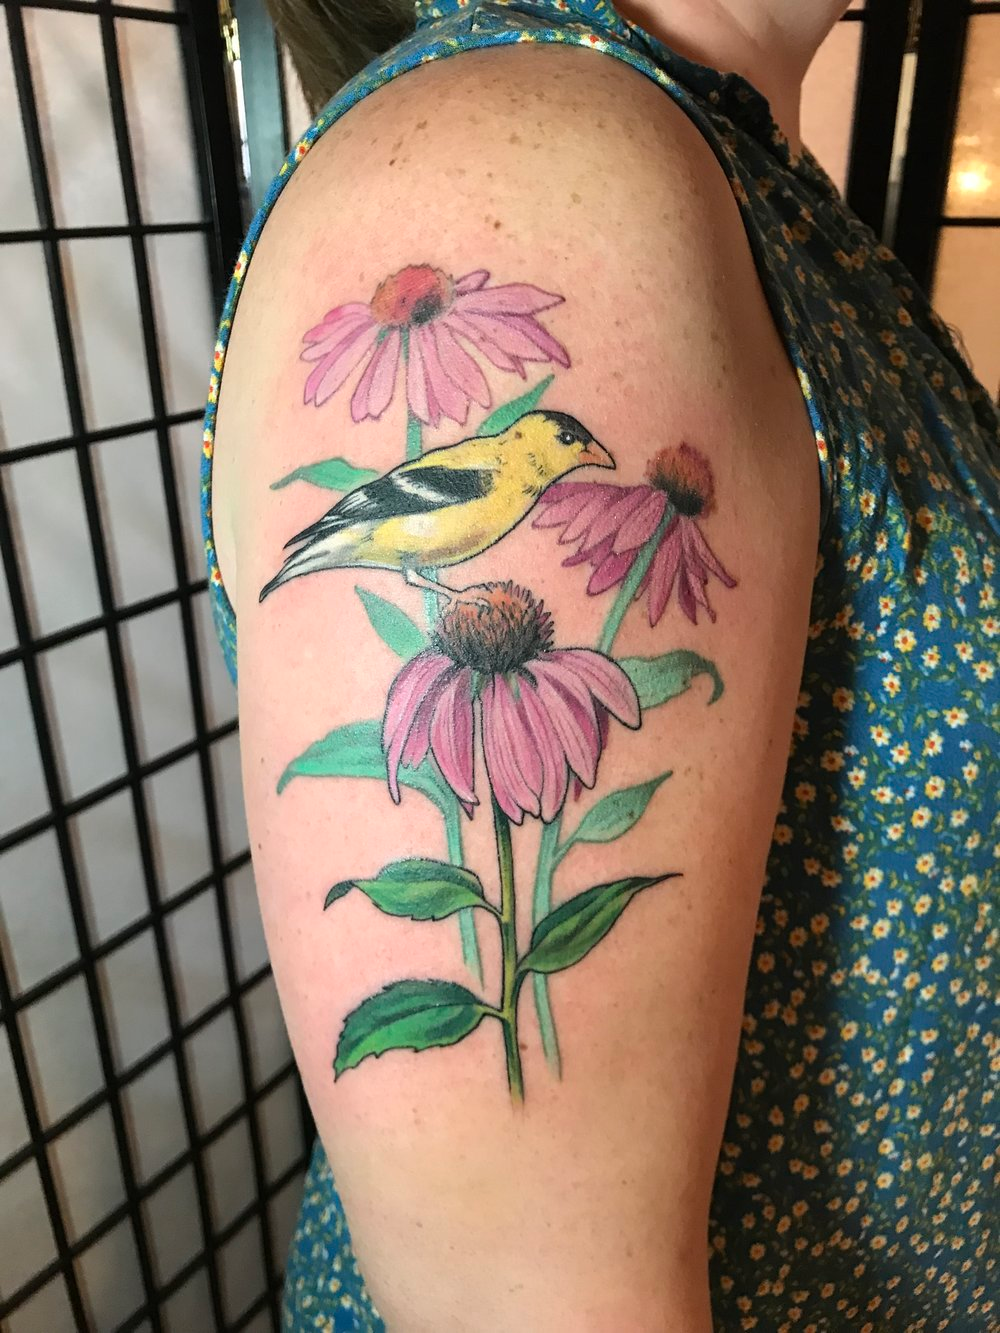 Coneflower Bee Tattoo Google Search In 2020 Bee Tattoo Tattoos Watercolor Tattoo